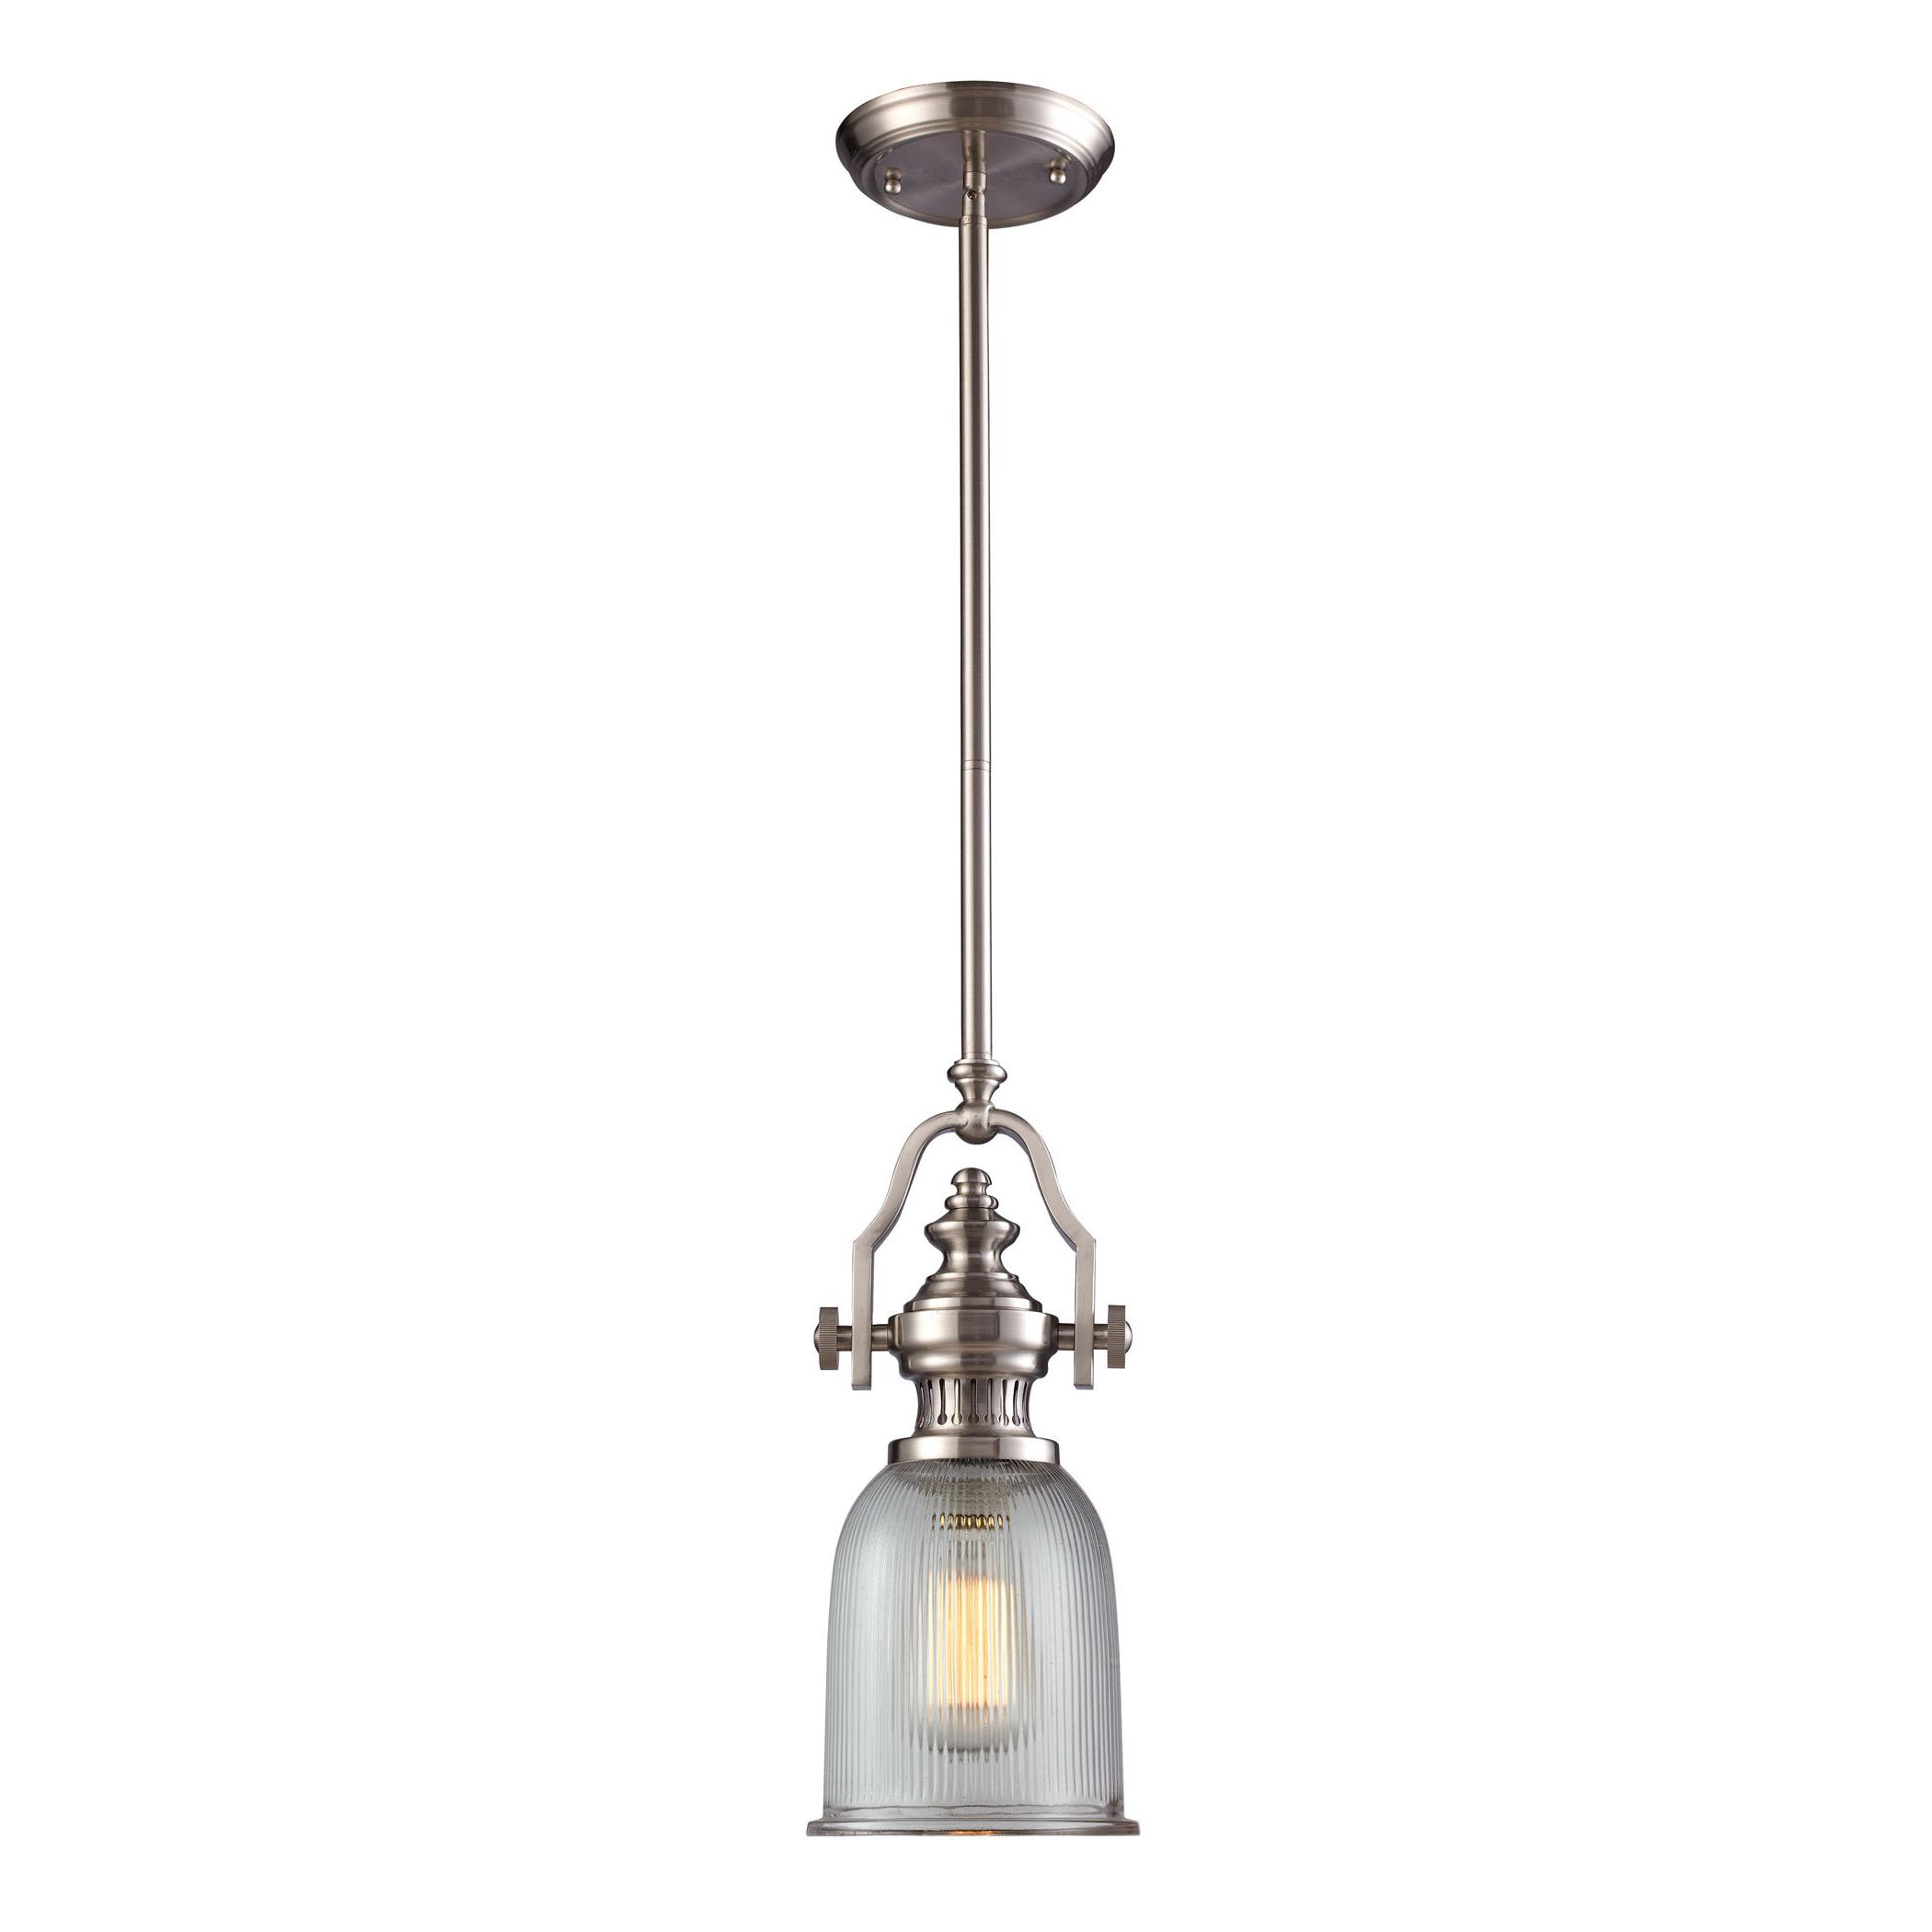 Famous Erico 1 Light Single Bell Pendants Pertaining To Erico 1 Light Single Bell Pendant (View 9 of 20)